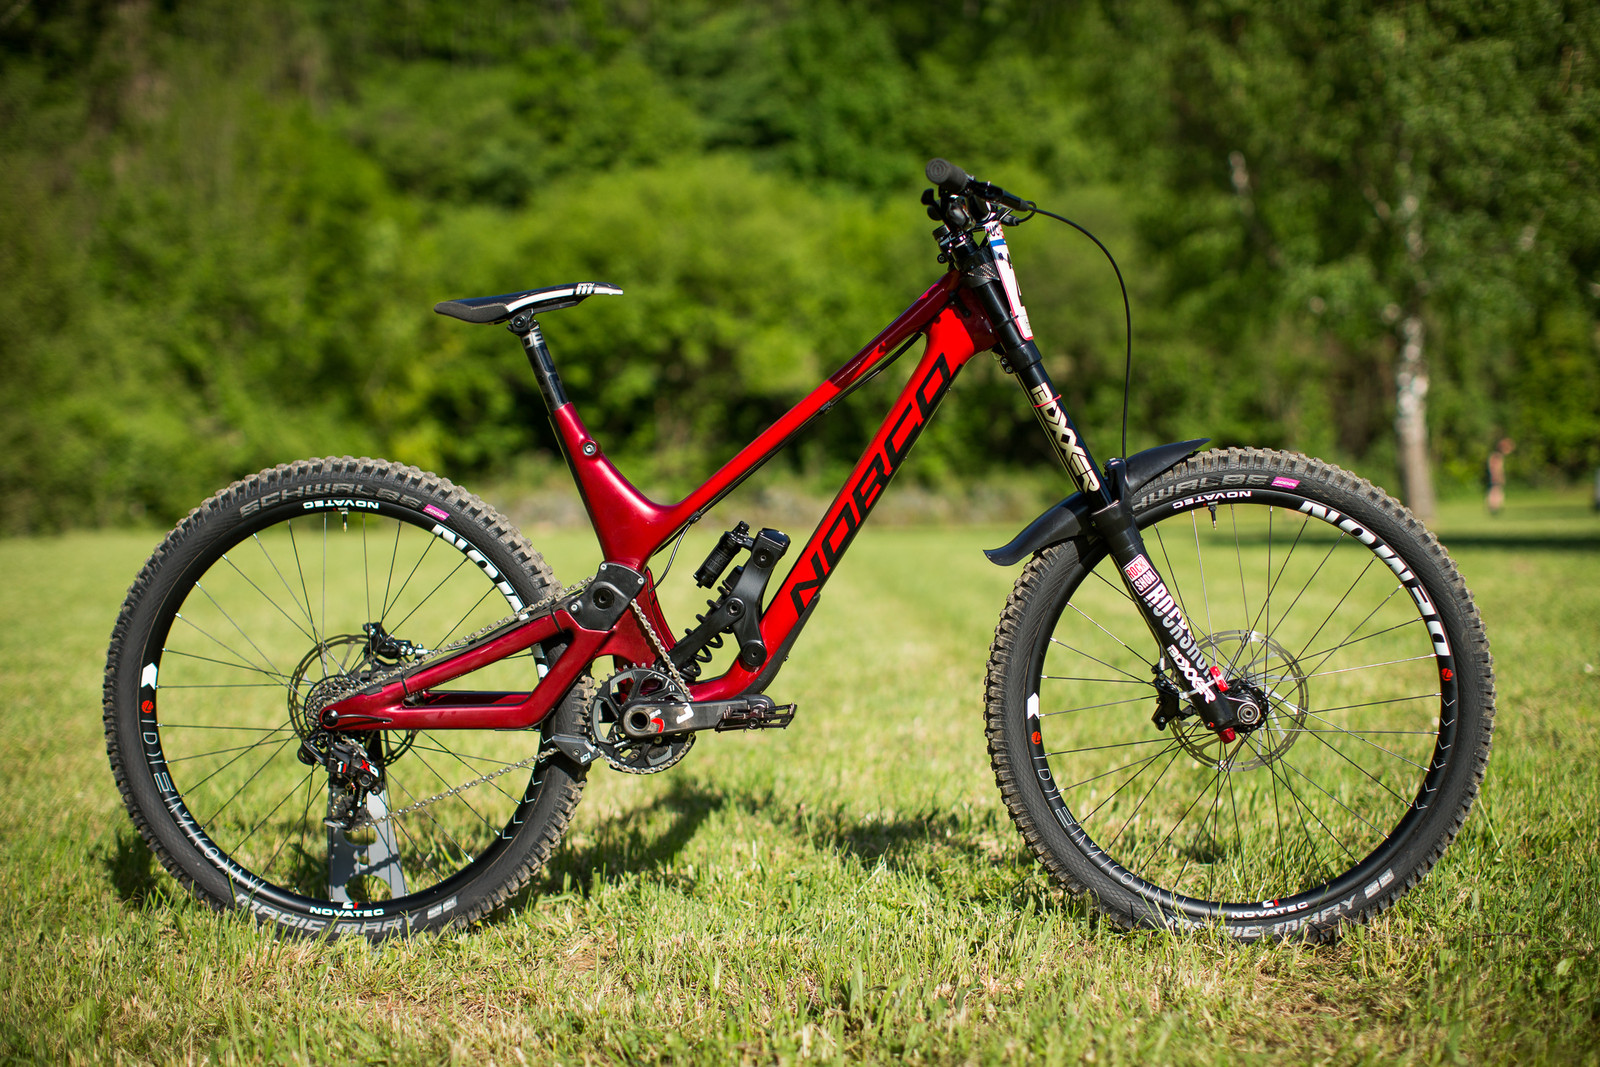 Joe Smith's Norco Race Development DH Prototype Bike - 2017 Lourdes World Cup Pit Bits - Mountain Biking Pictures - Vital MTB